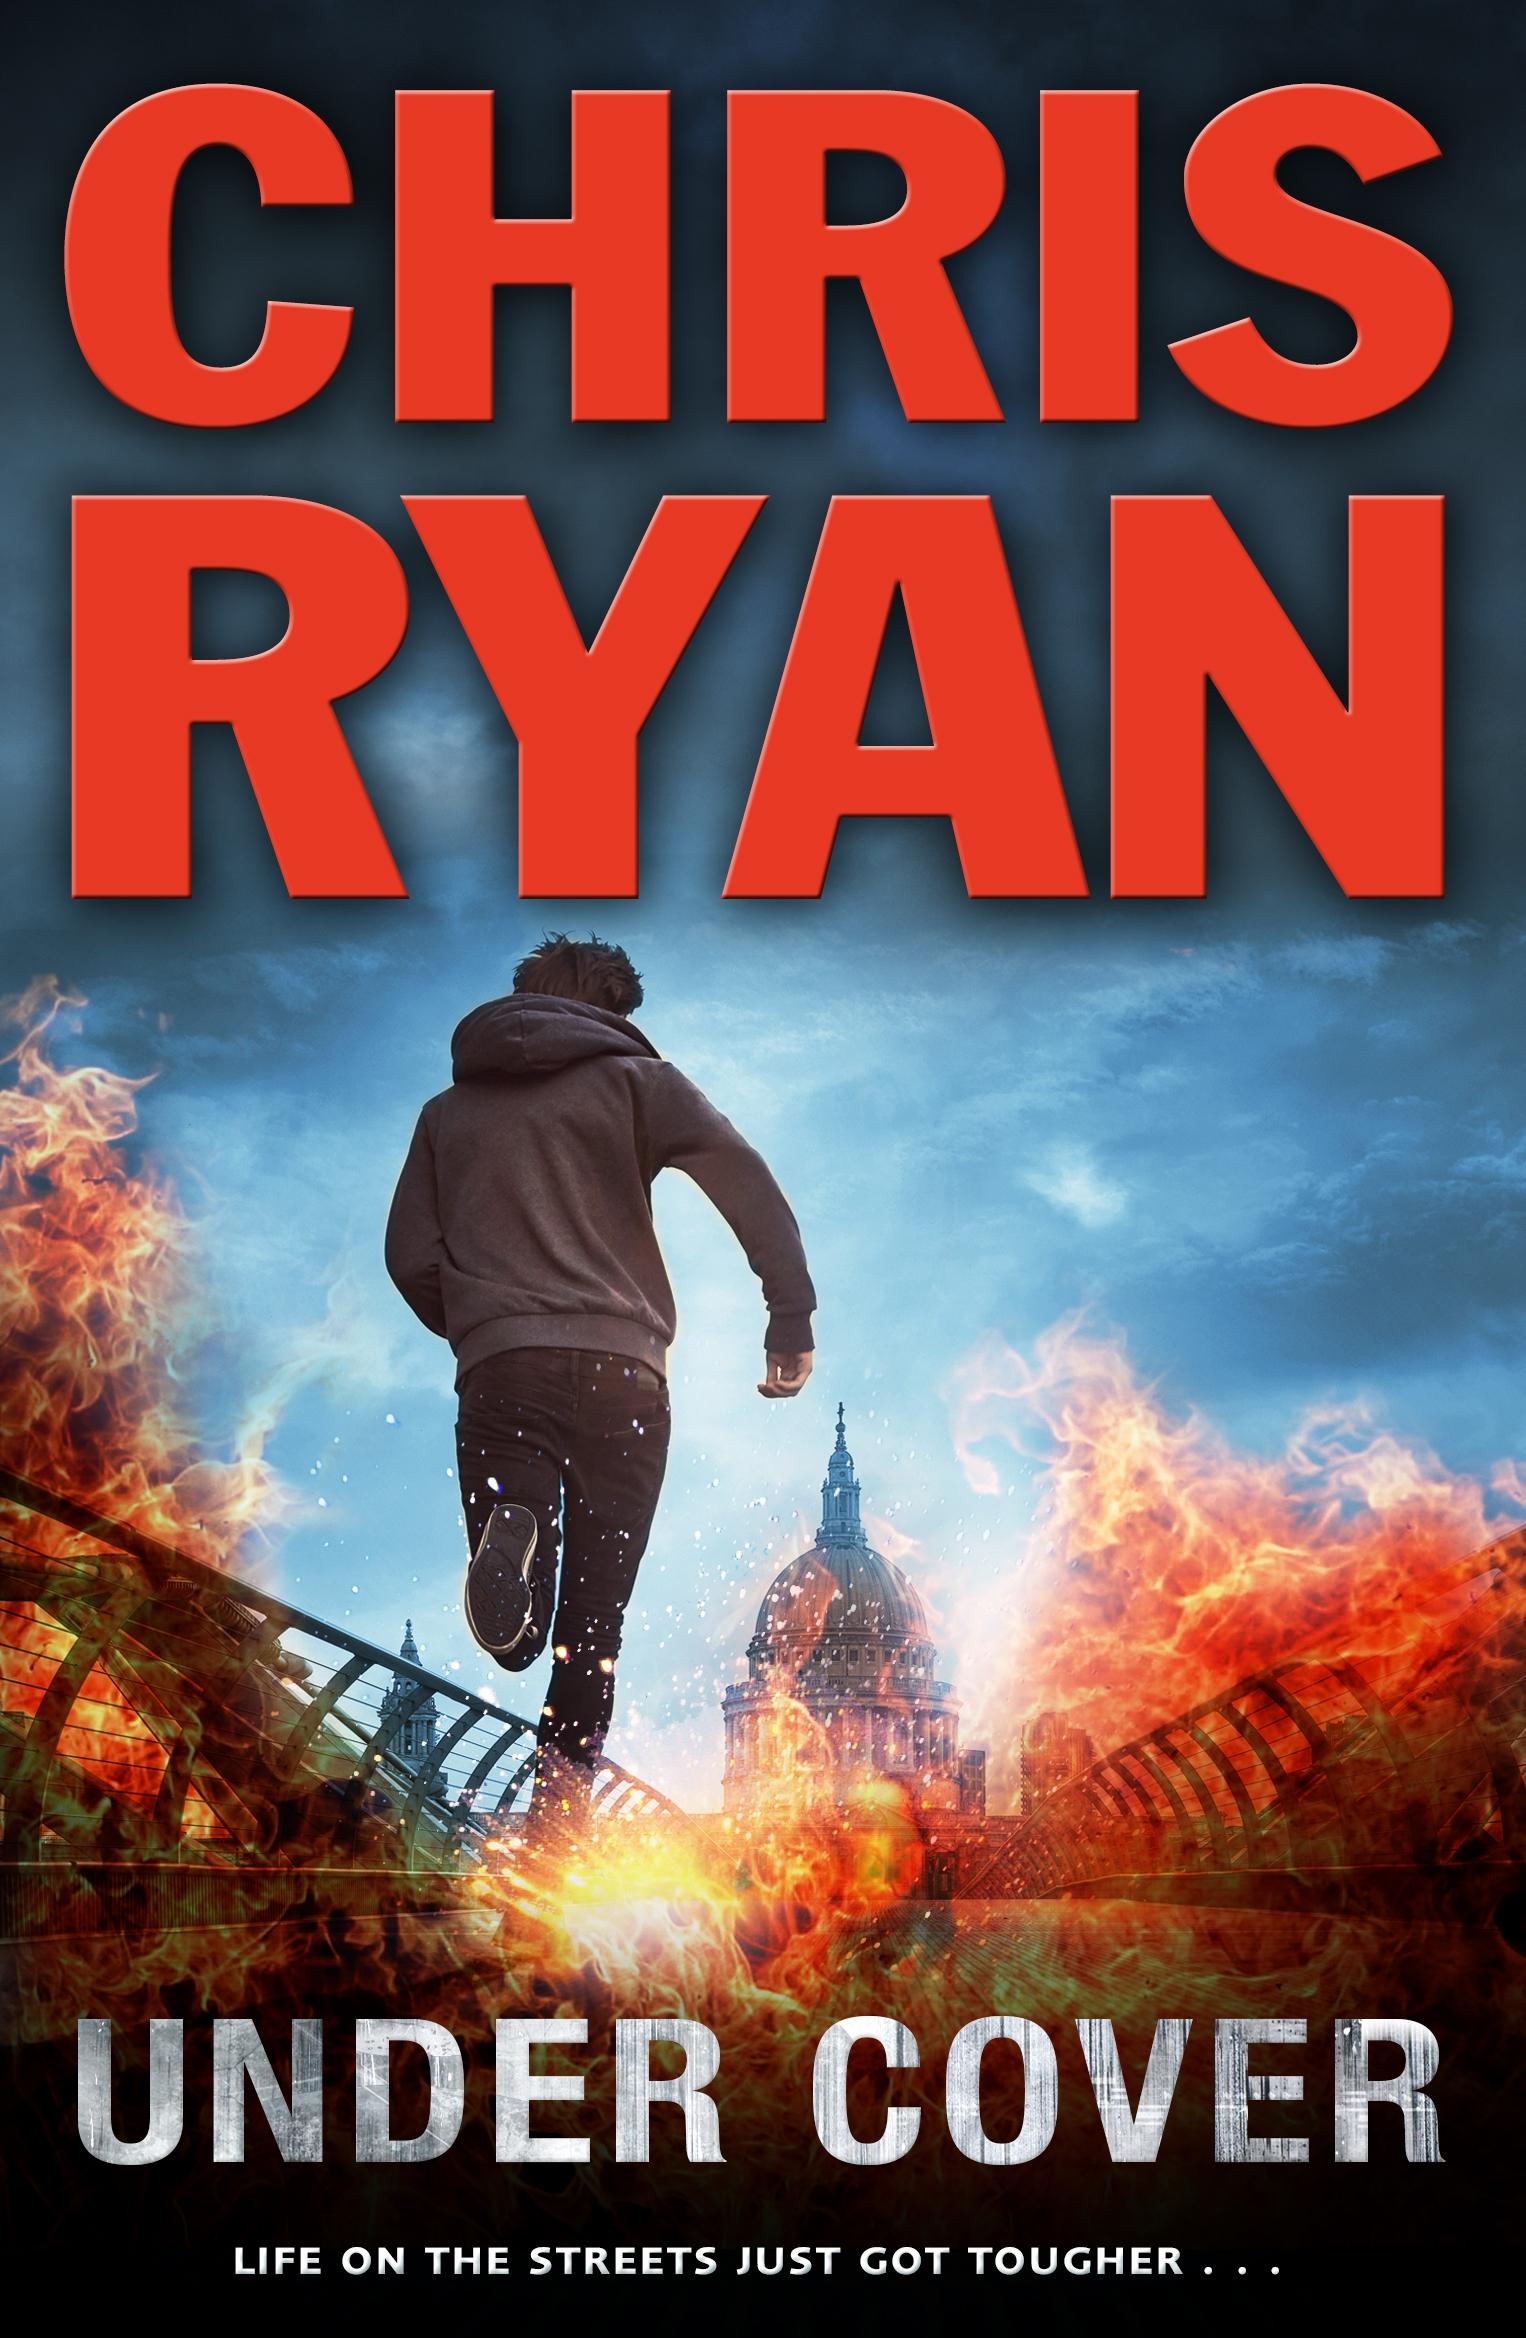 About Chris Ryan